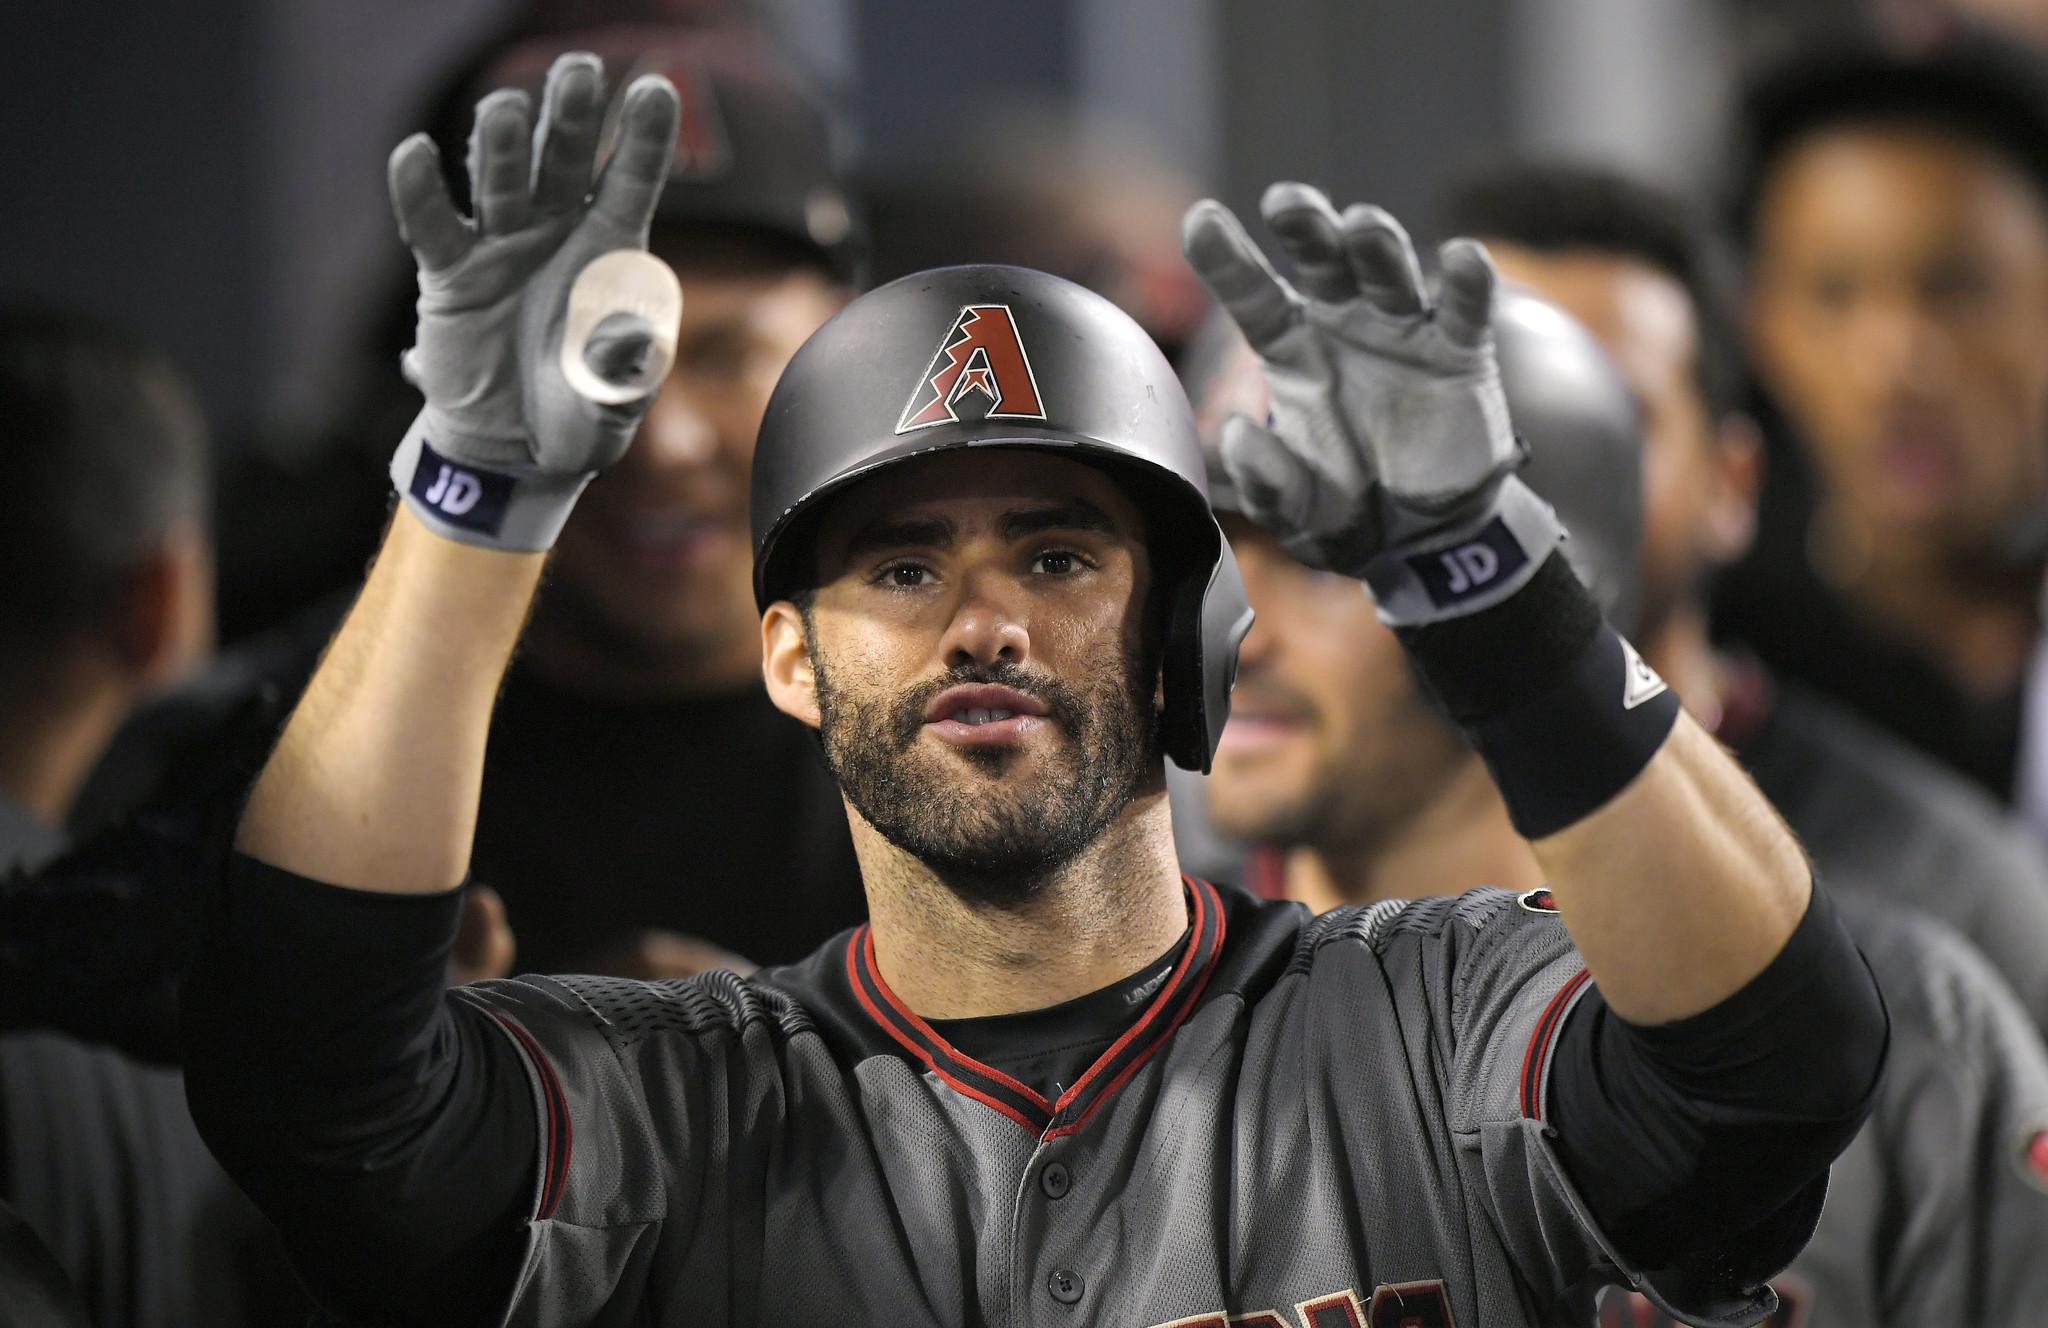 Diamondbacks' J.D. Martinez hits 4 home runs, ties MLB record - Orlando Sentinel